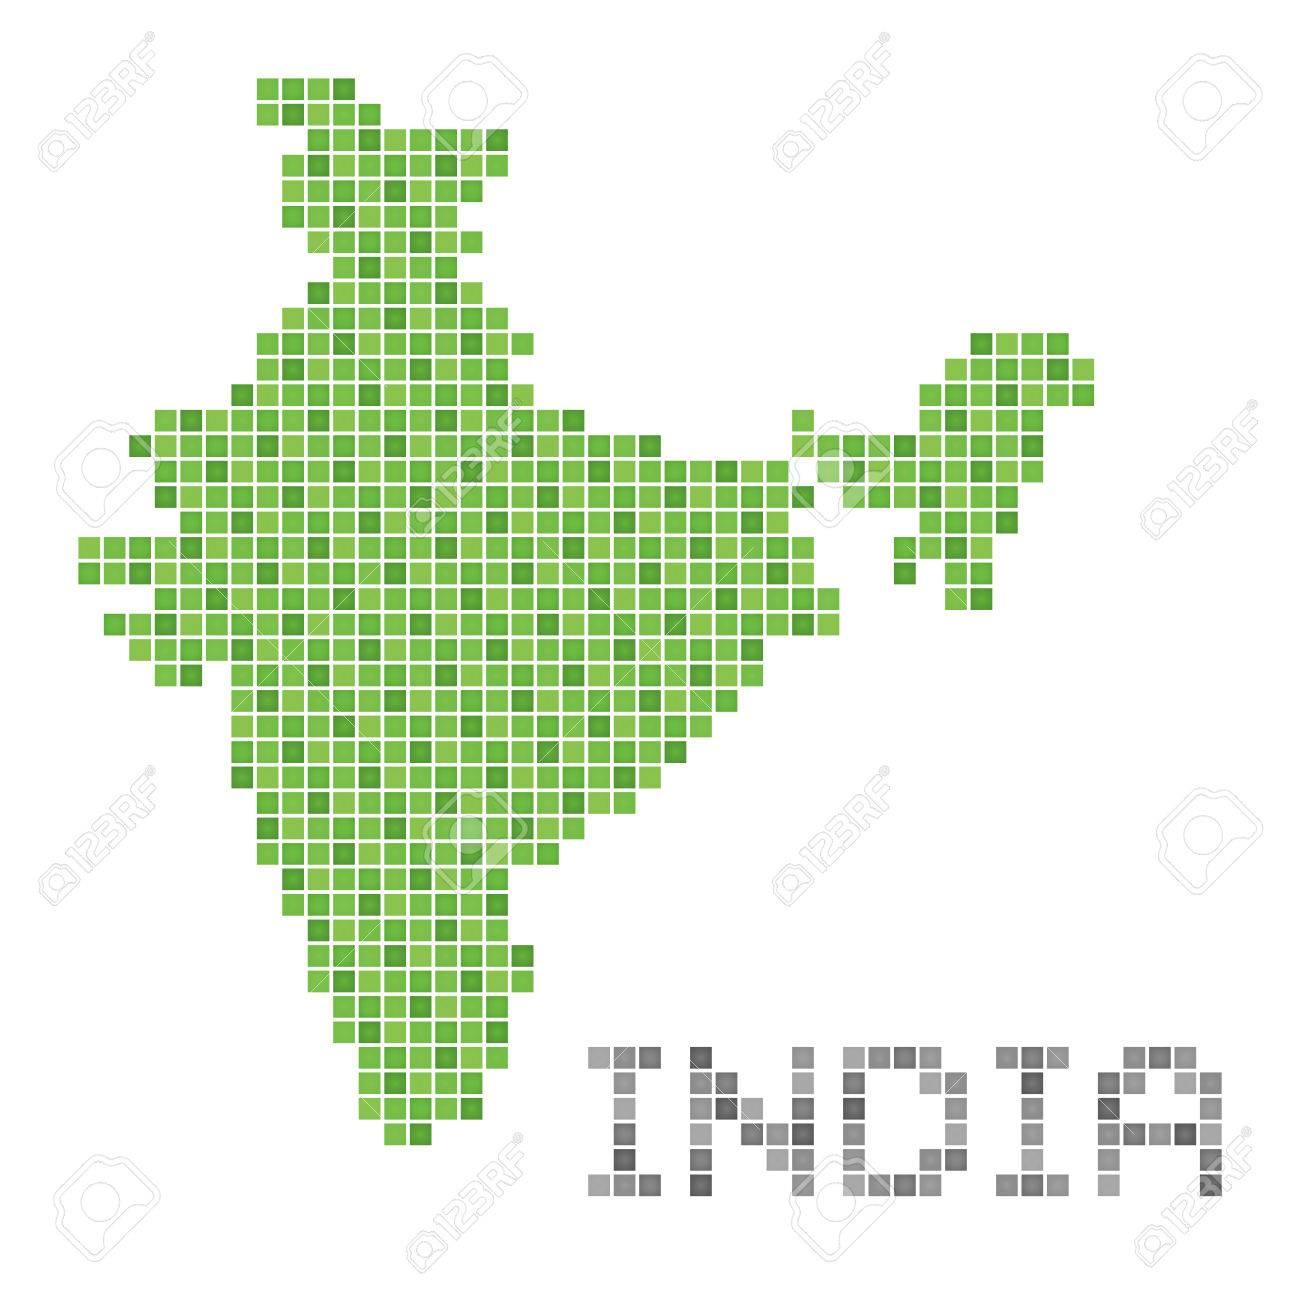 Pixel Art Of India Green